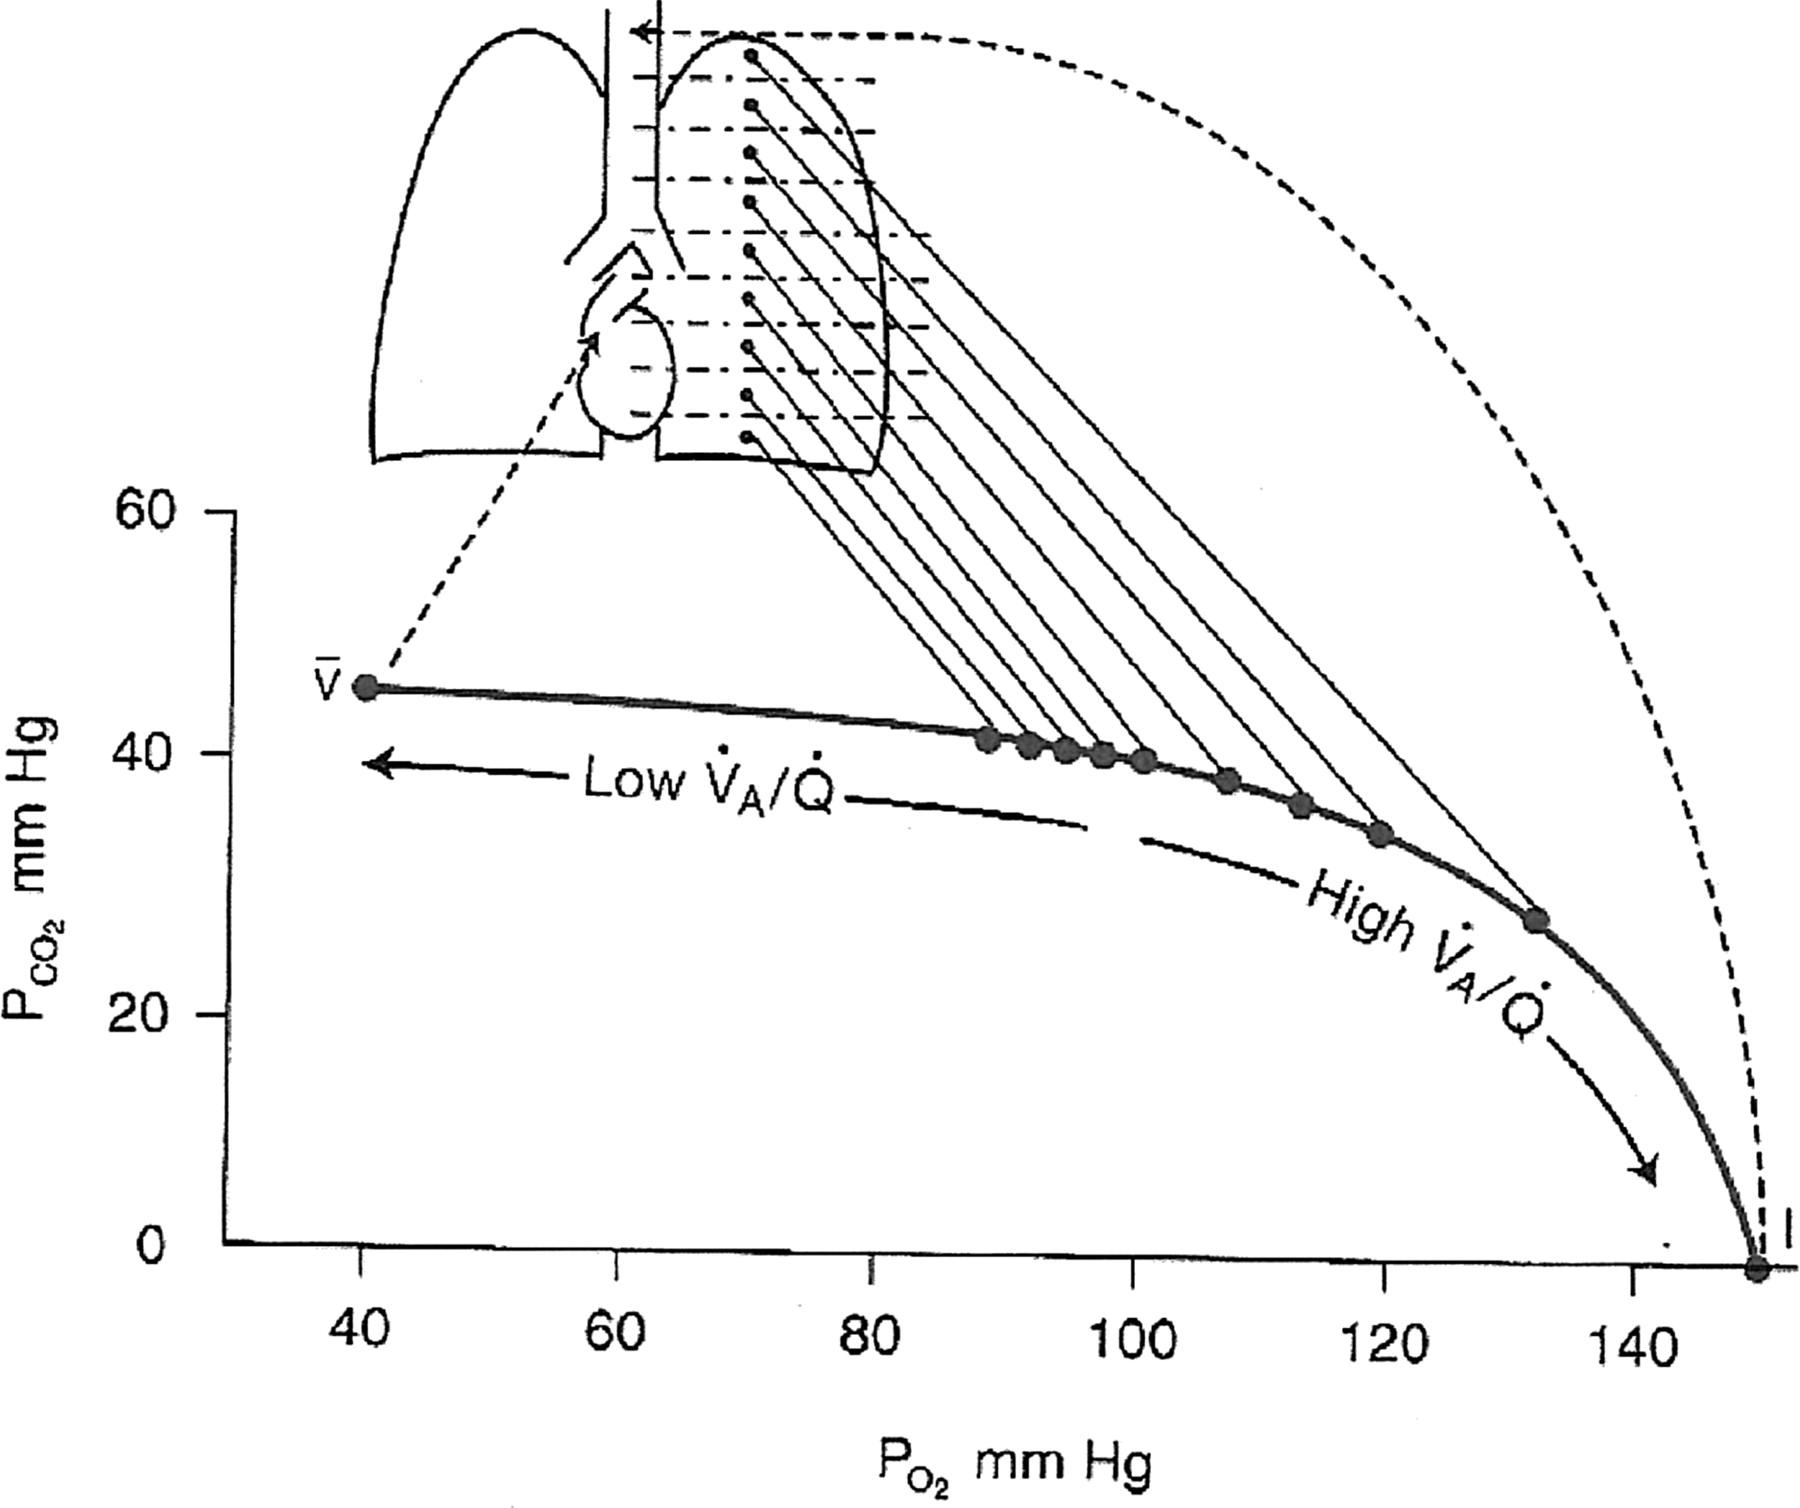 Ventilation-perfusion ratio